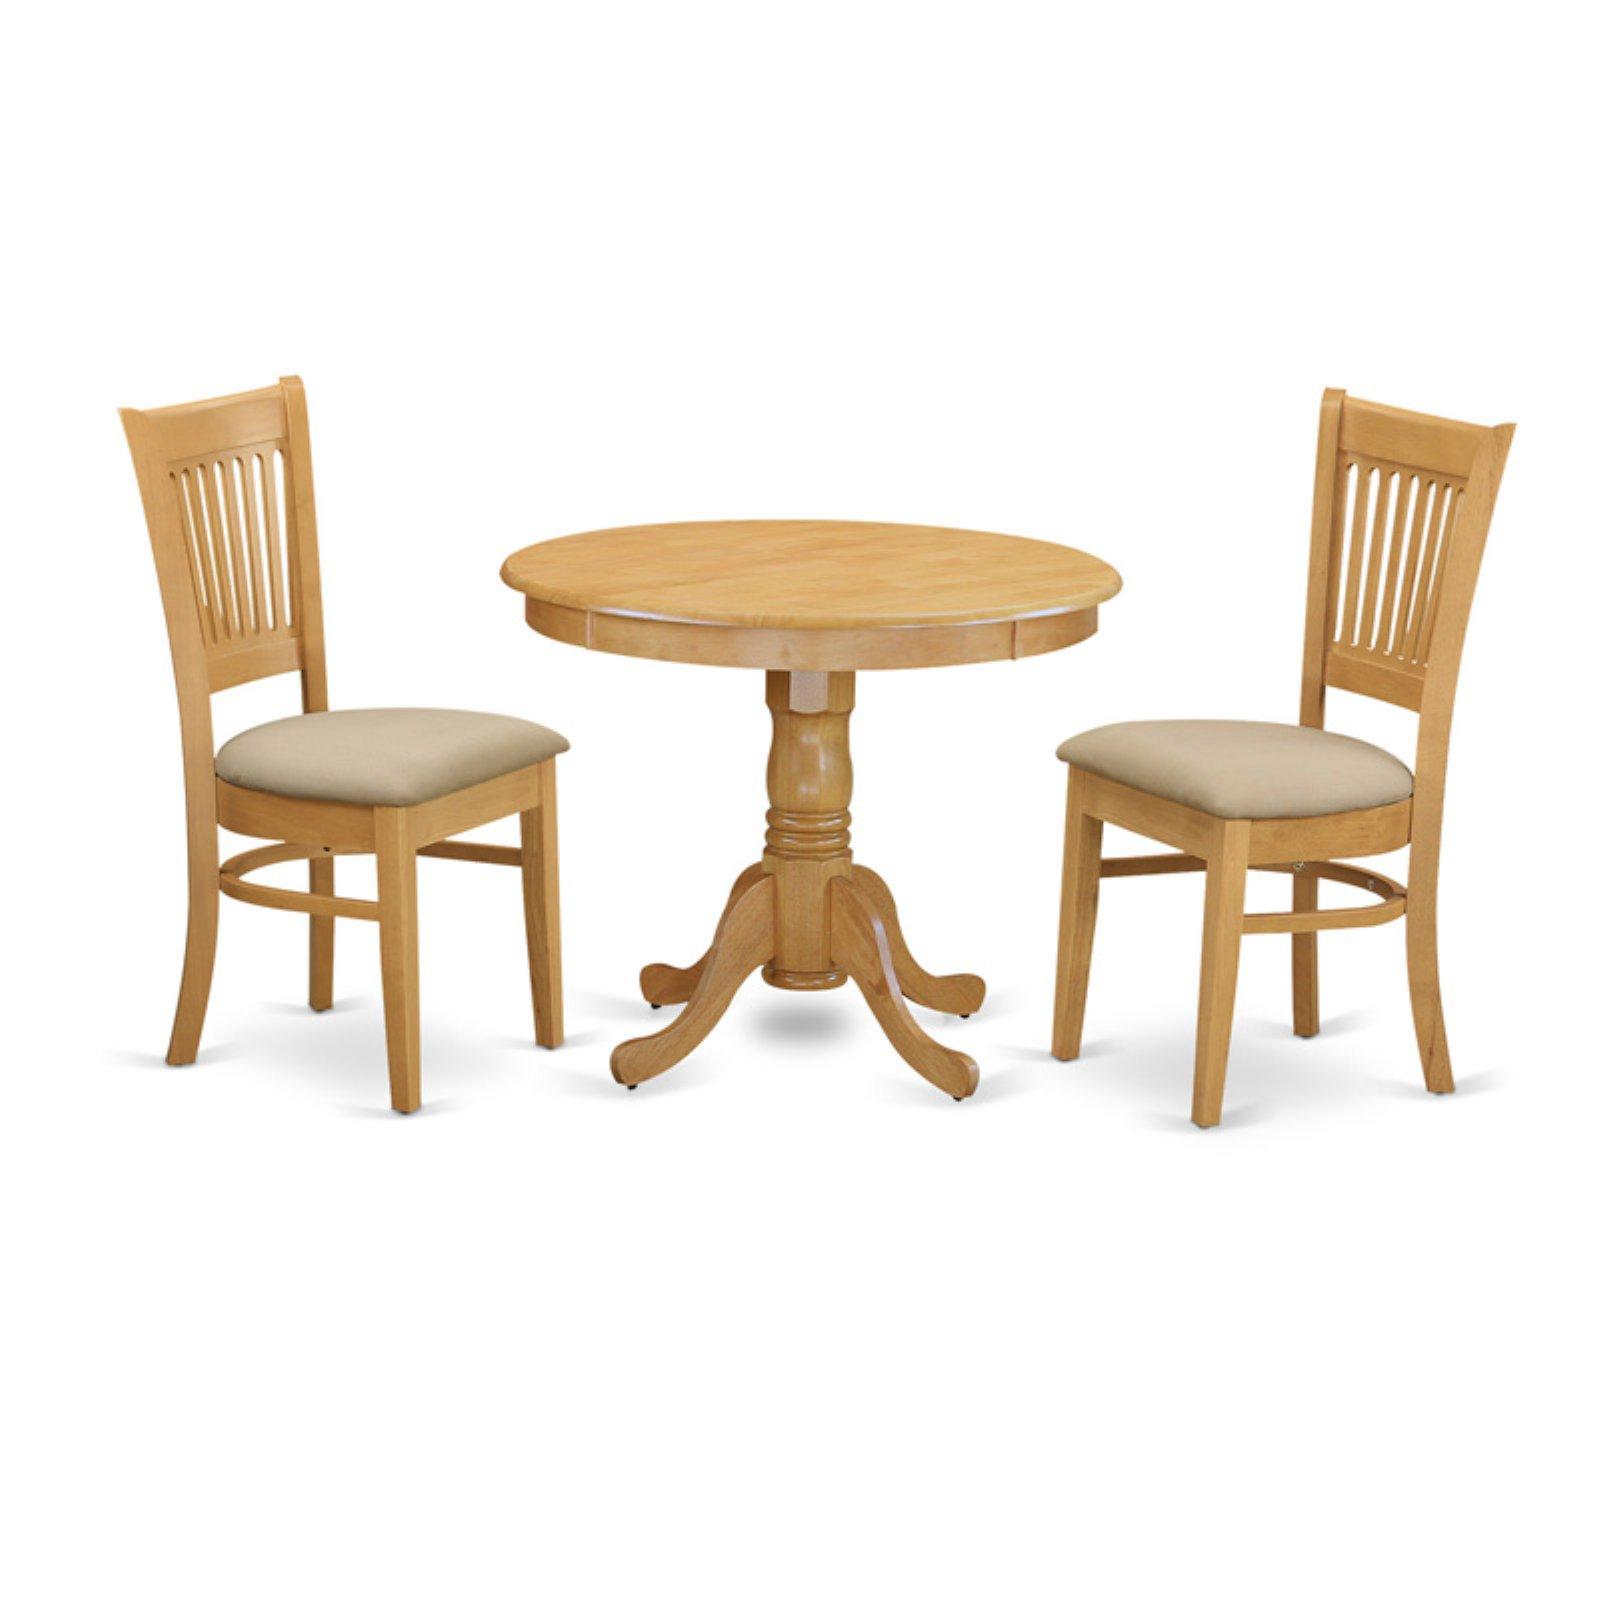 East West Furniture 3 Piece Hepplewhite Modern Kitchen Dinette Dining Table Set